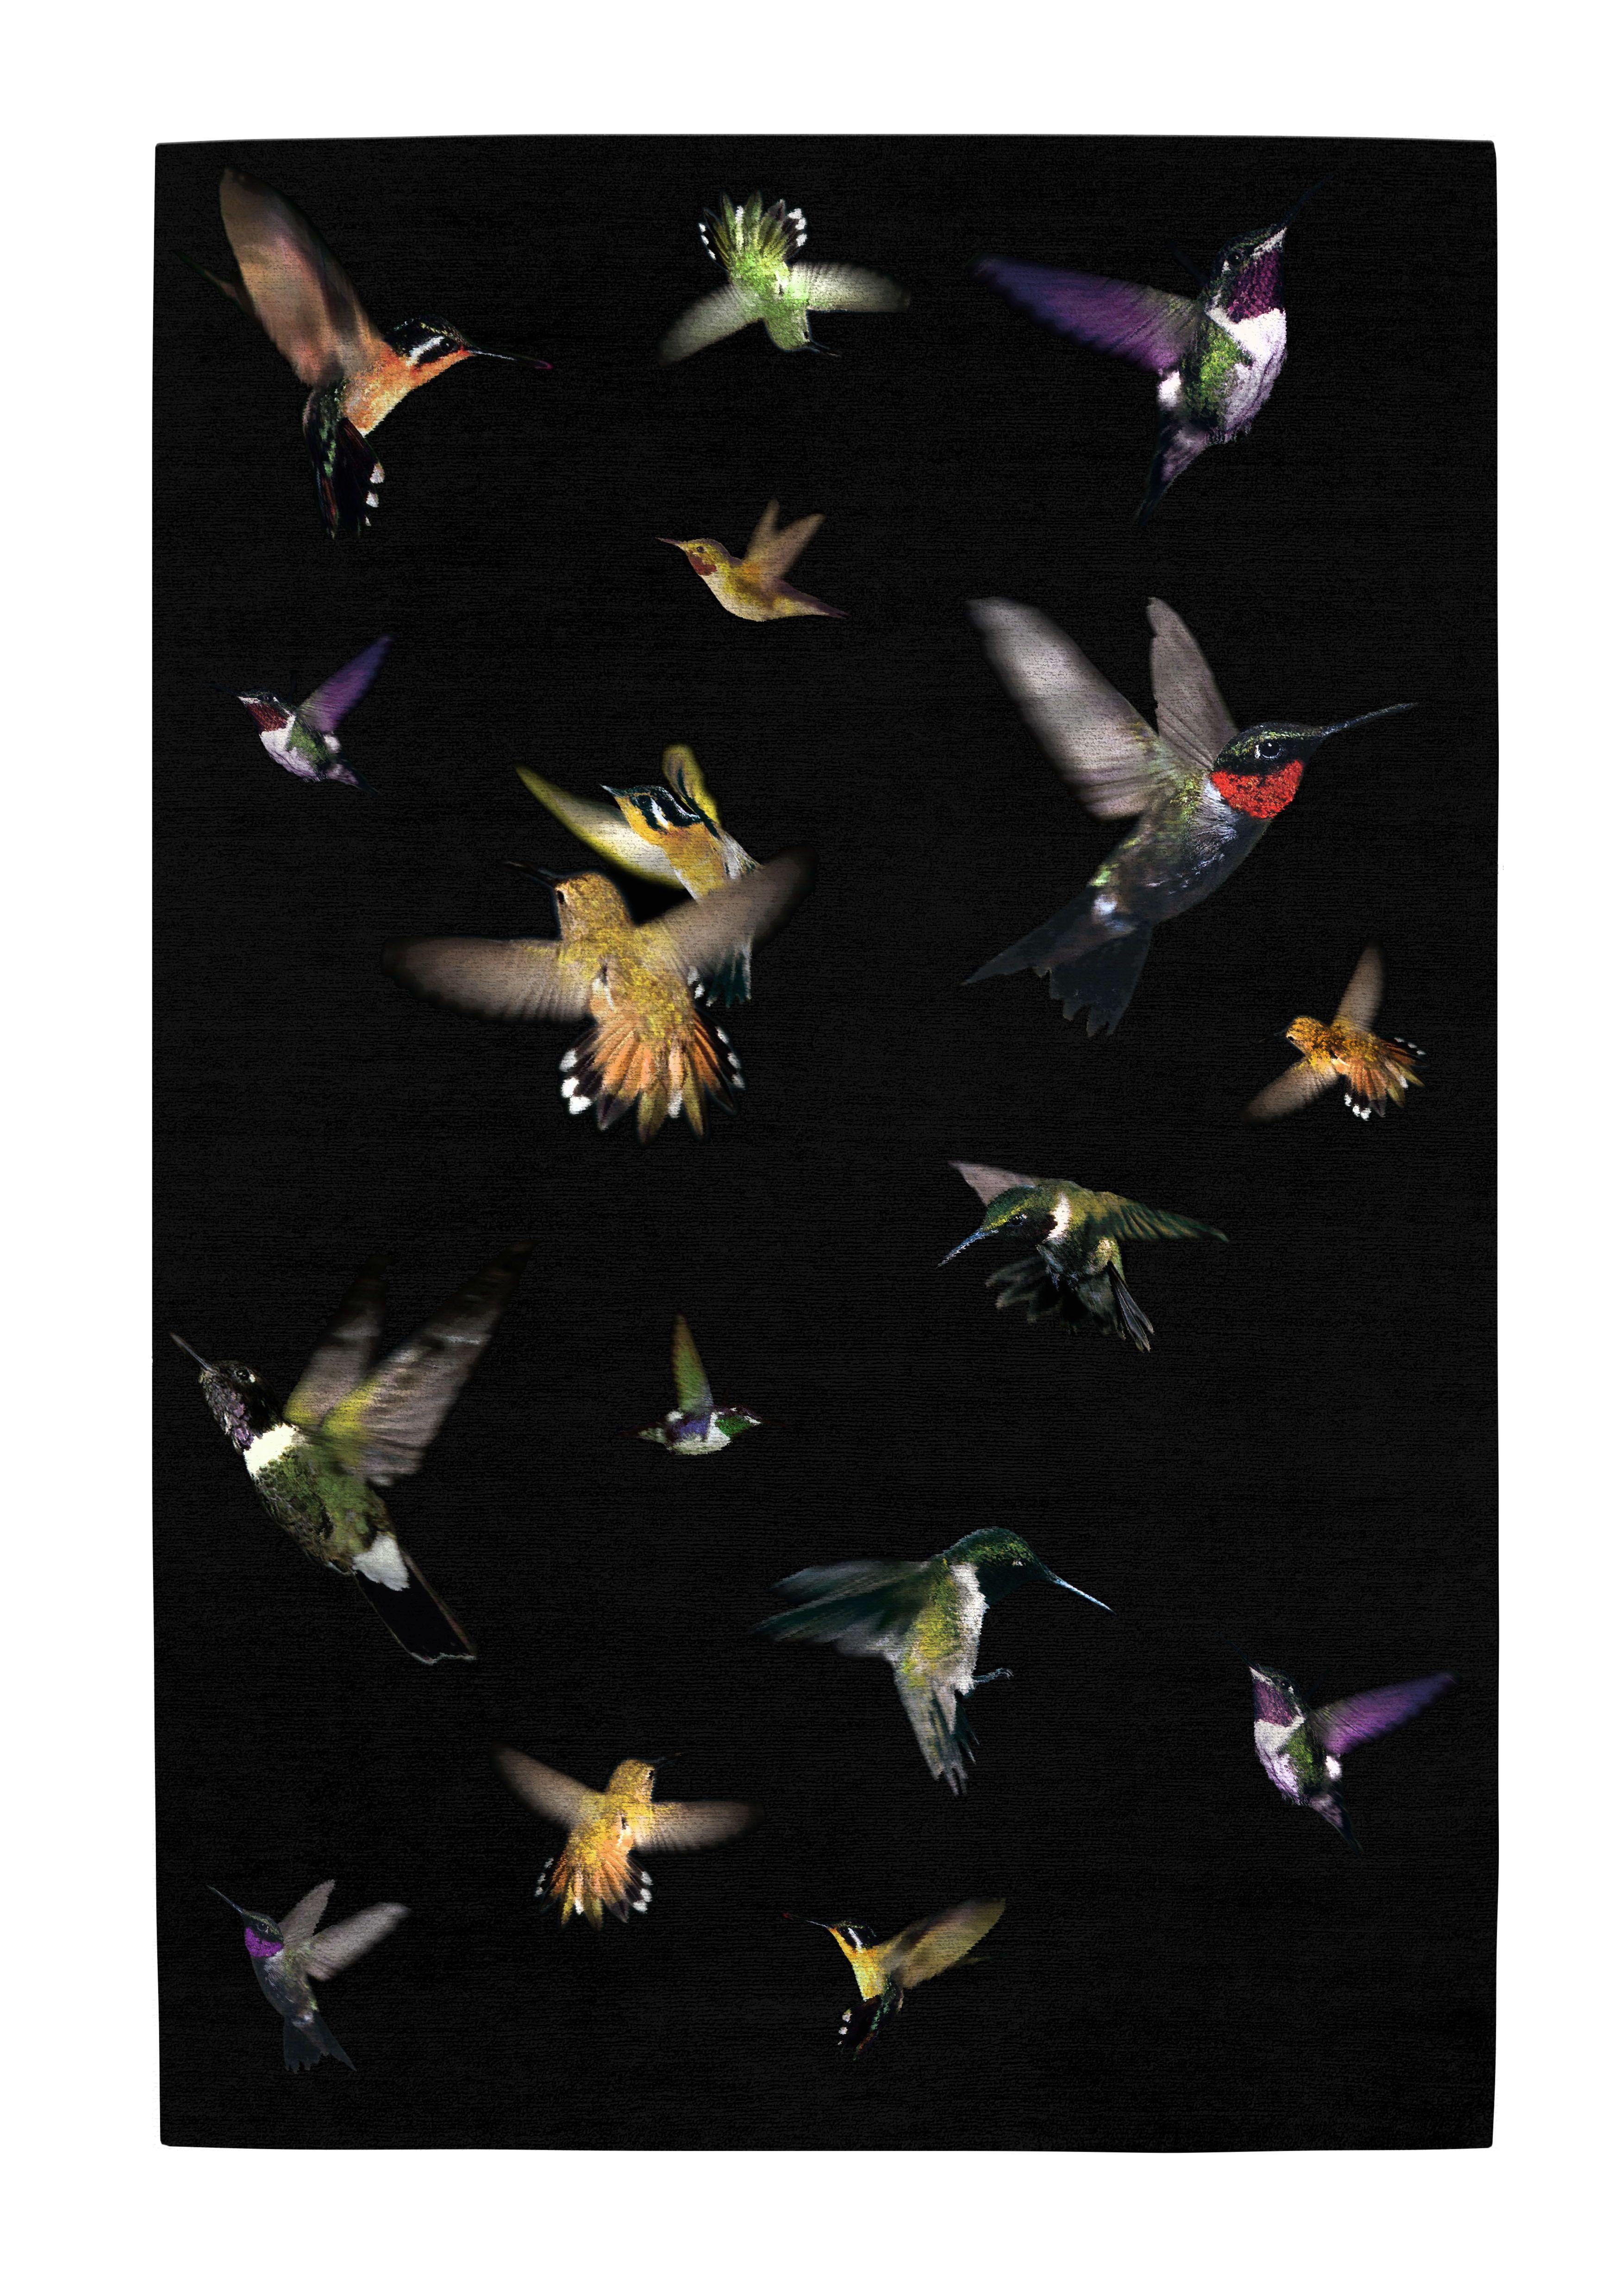 Hummingbirds Alexander Mcqueen Rug My Domestic Heart Melts With Joy